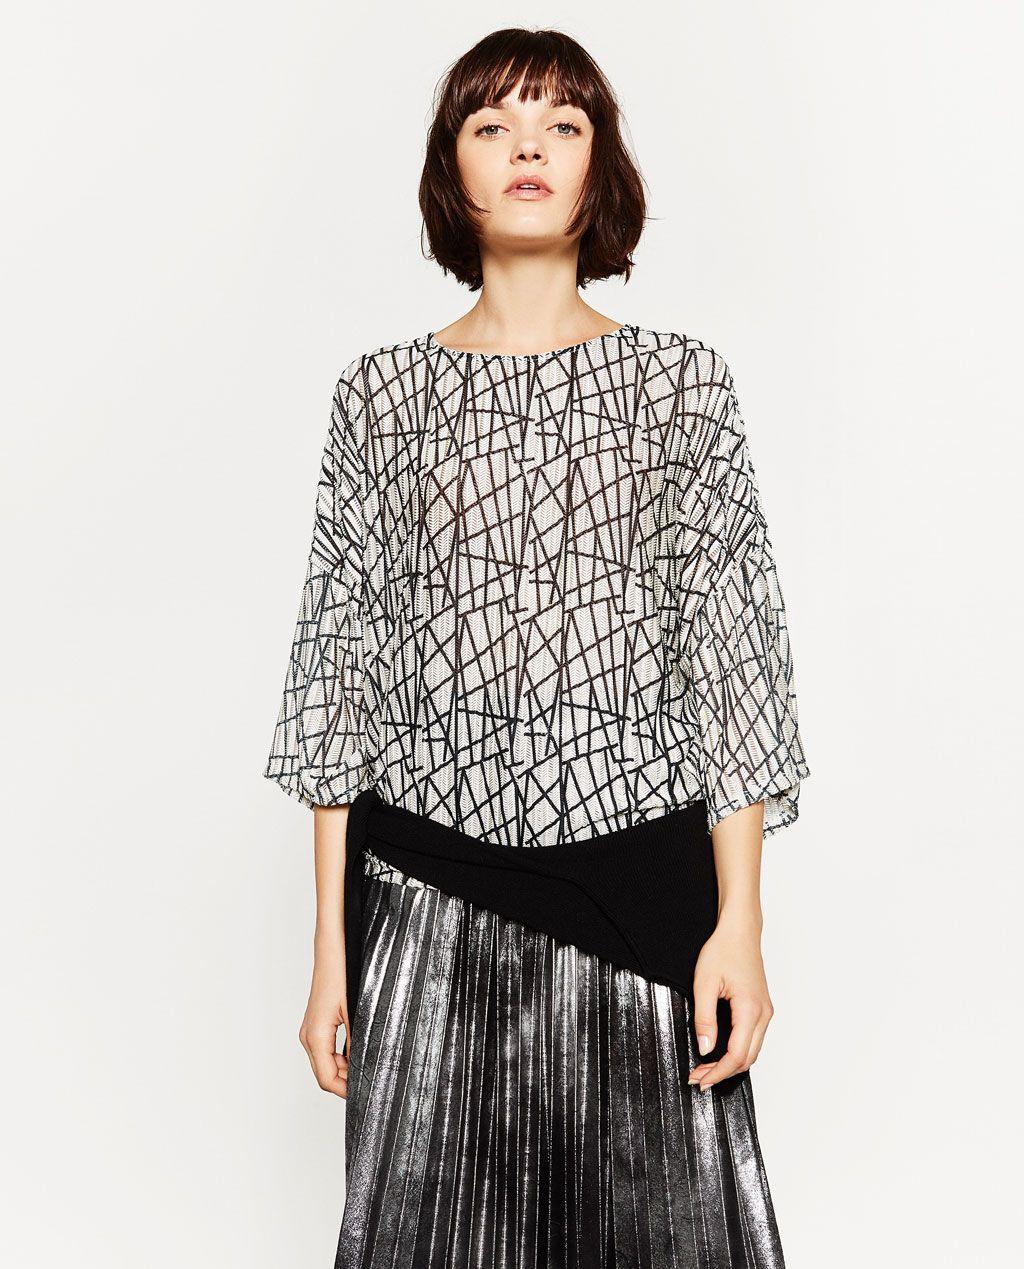 6e1cd8fa90 ZARA - SALE - PRINTED T-SHIRT New Look Fashion